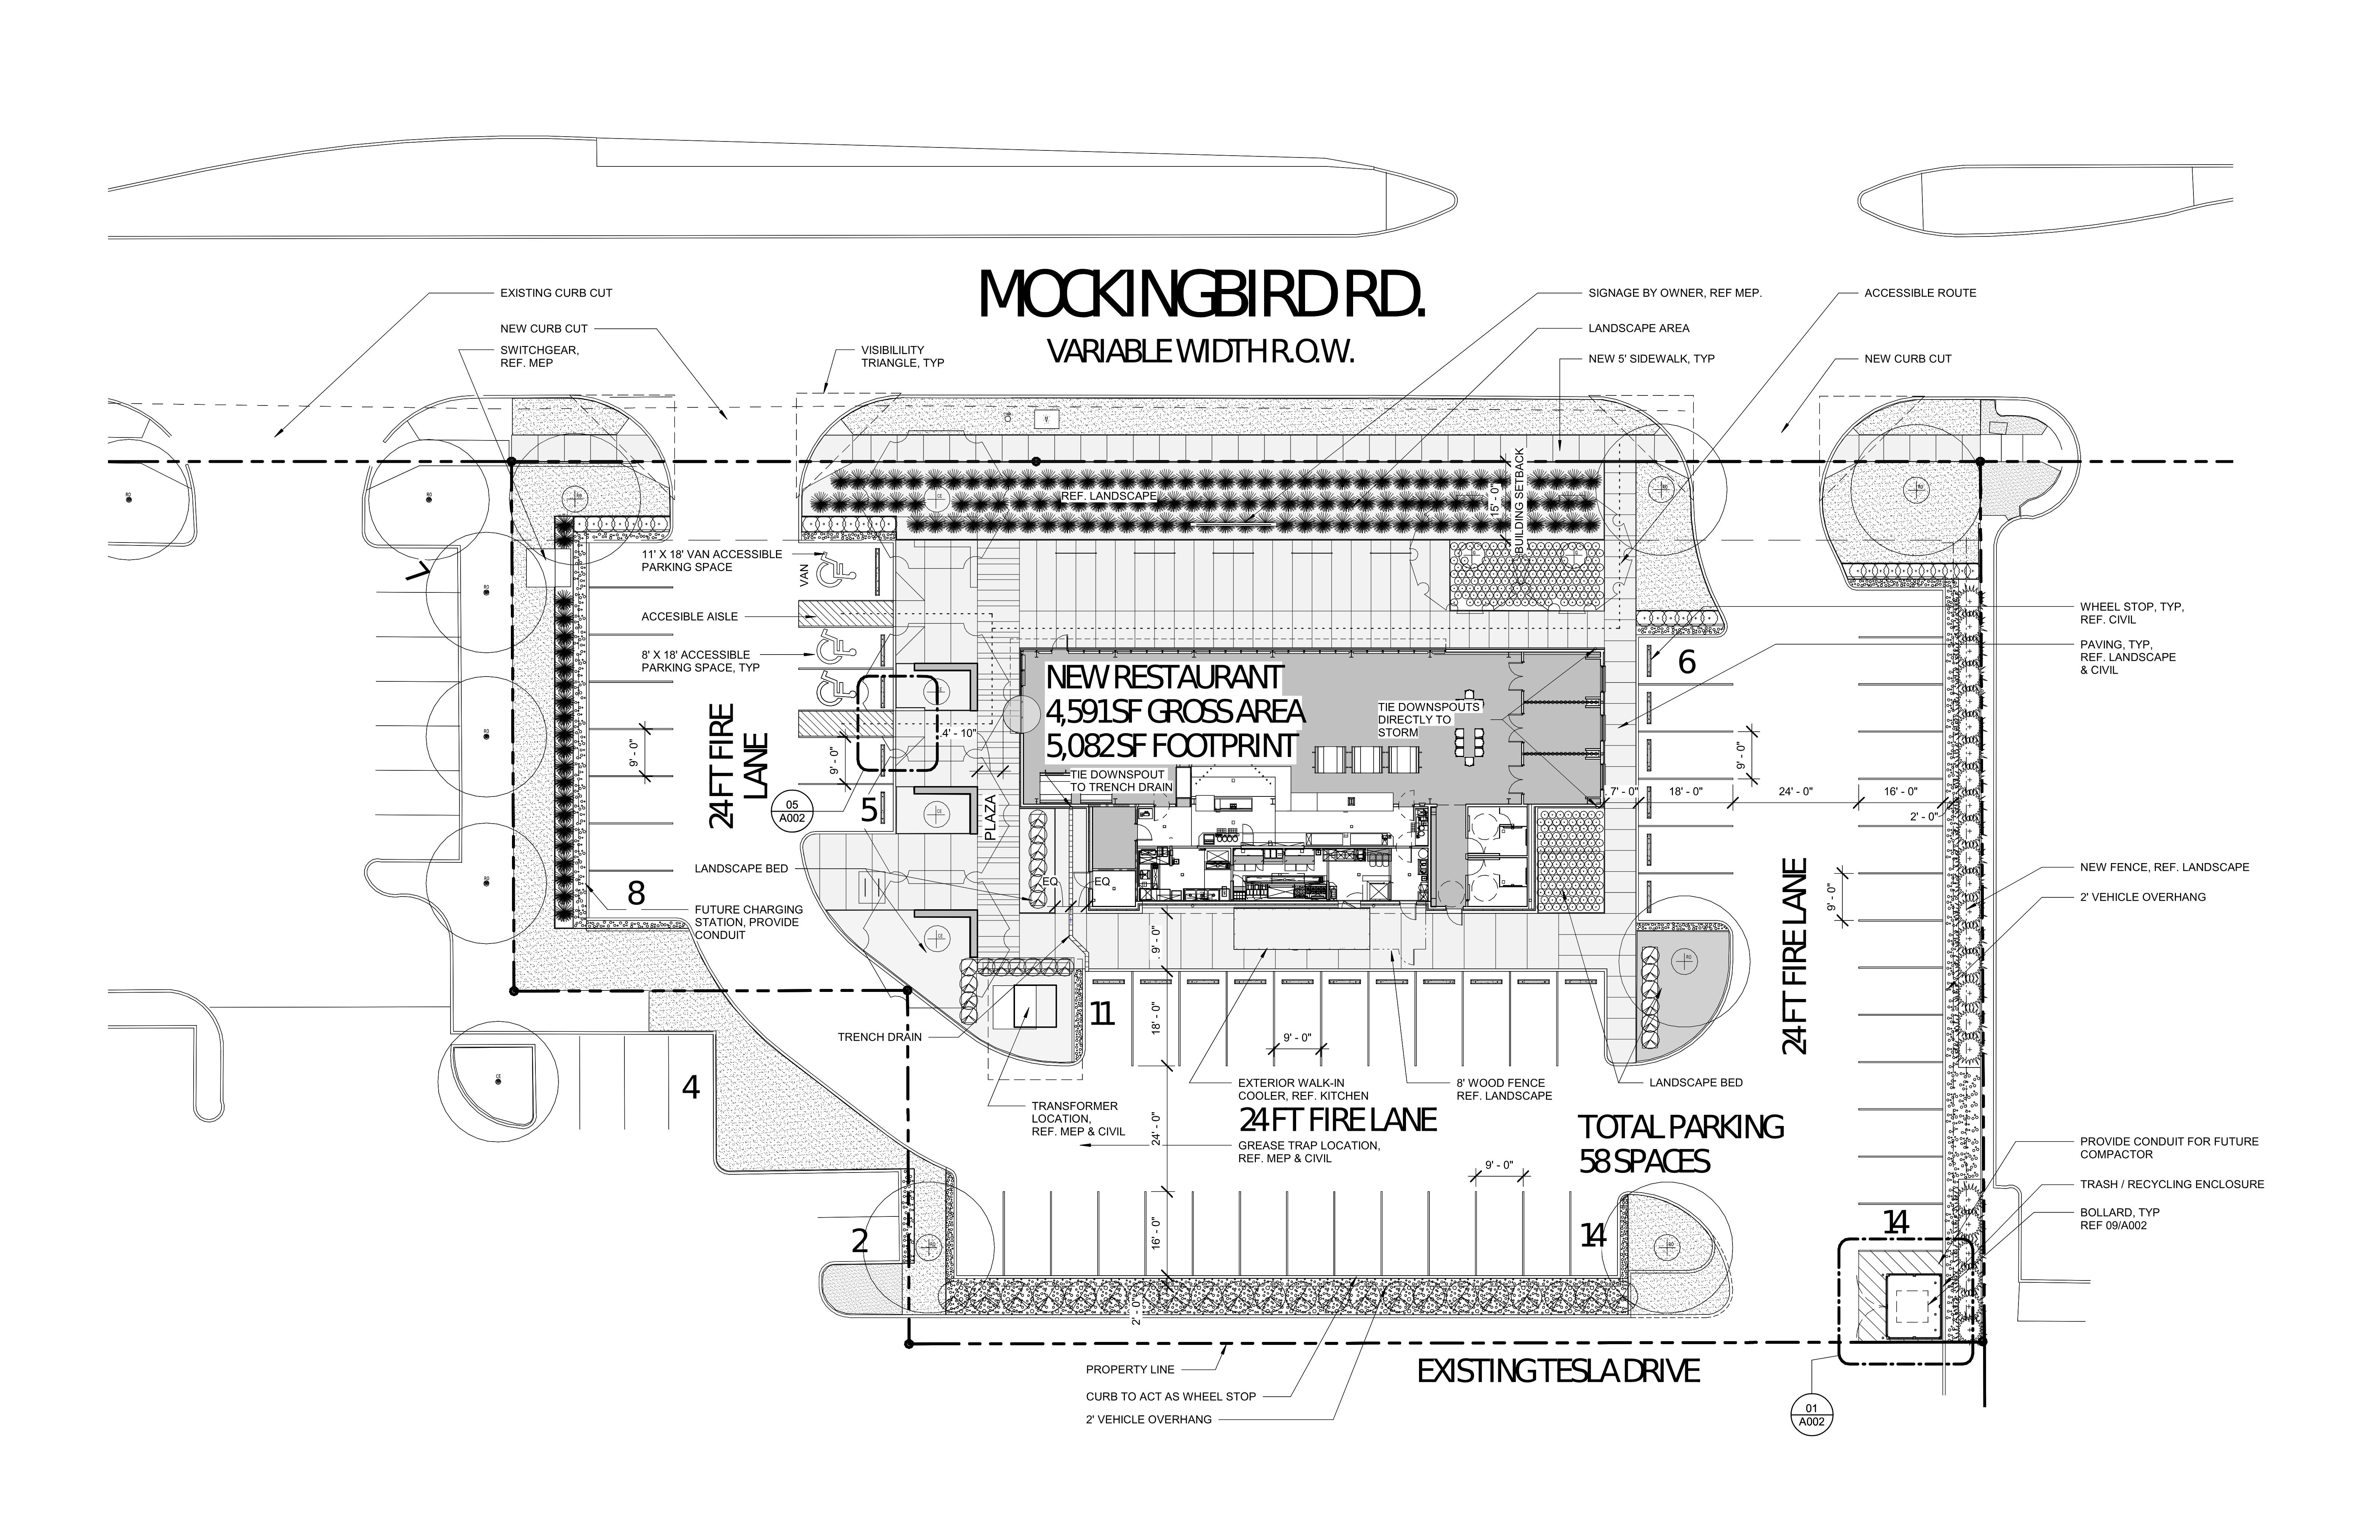 3130 W Mockingbird Ln: site plan